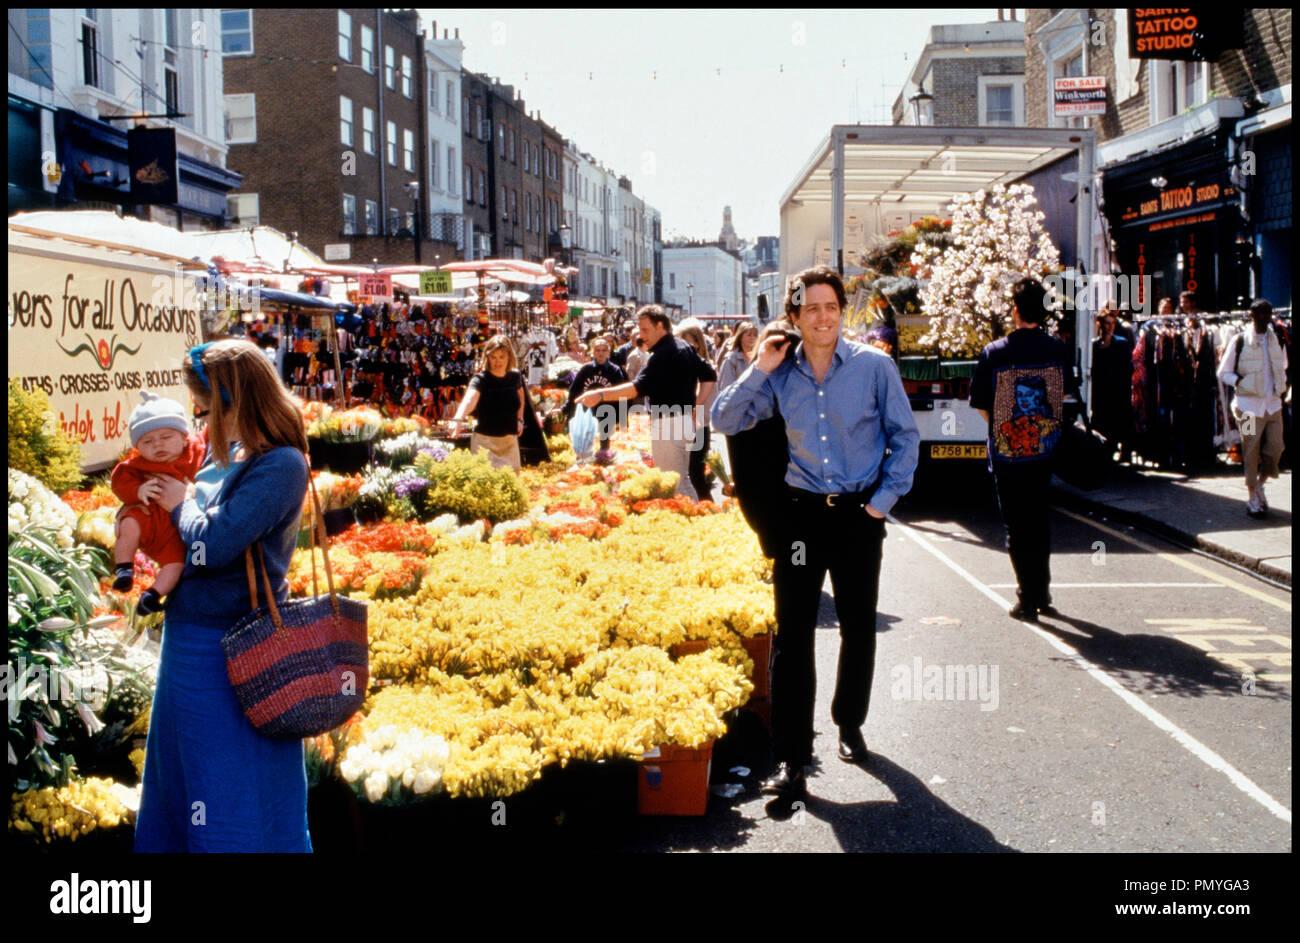 Prod DB © PolyGram - Working Title / DR COUP DE FOUDRE A NOTTING HILL (NOTTING HILL) de Roger Michell 1999 GB avec Hugh Grant marche, fleurs - Stock Image